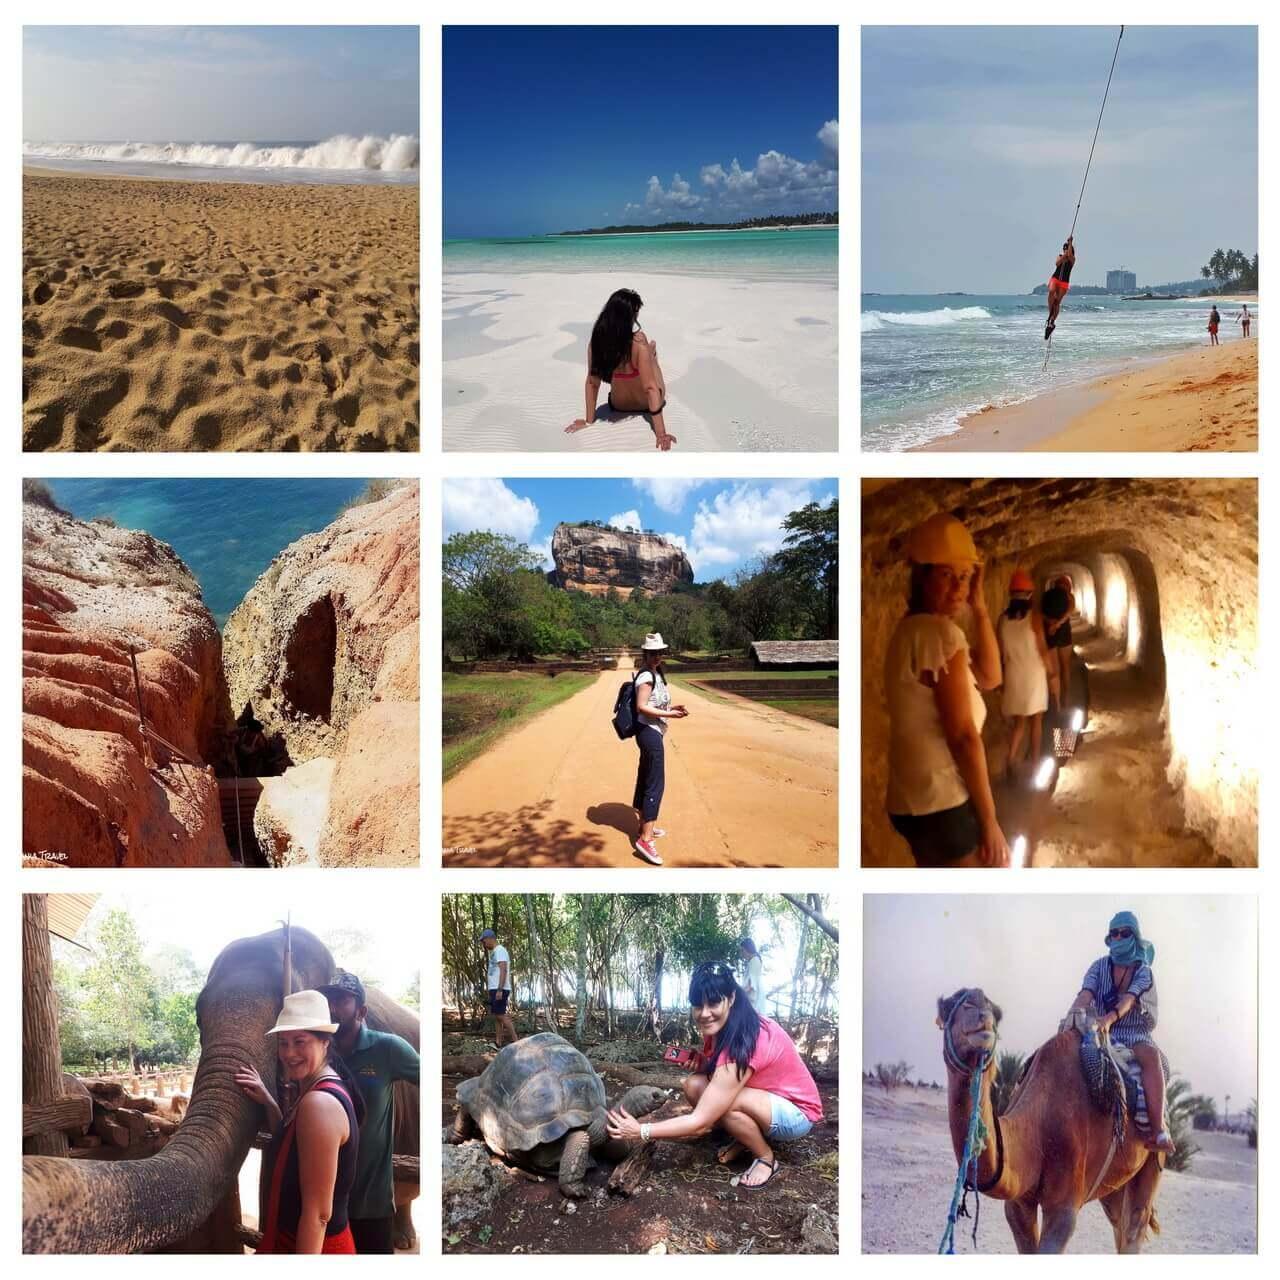 Traveling adventures, Natania travel blog